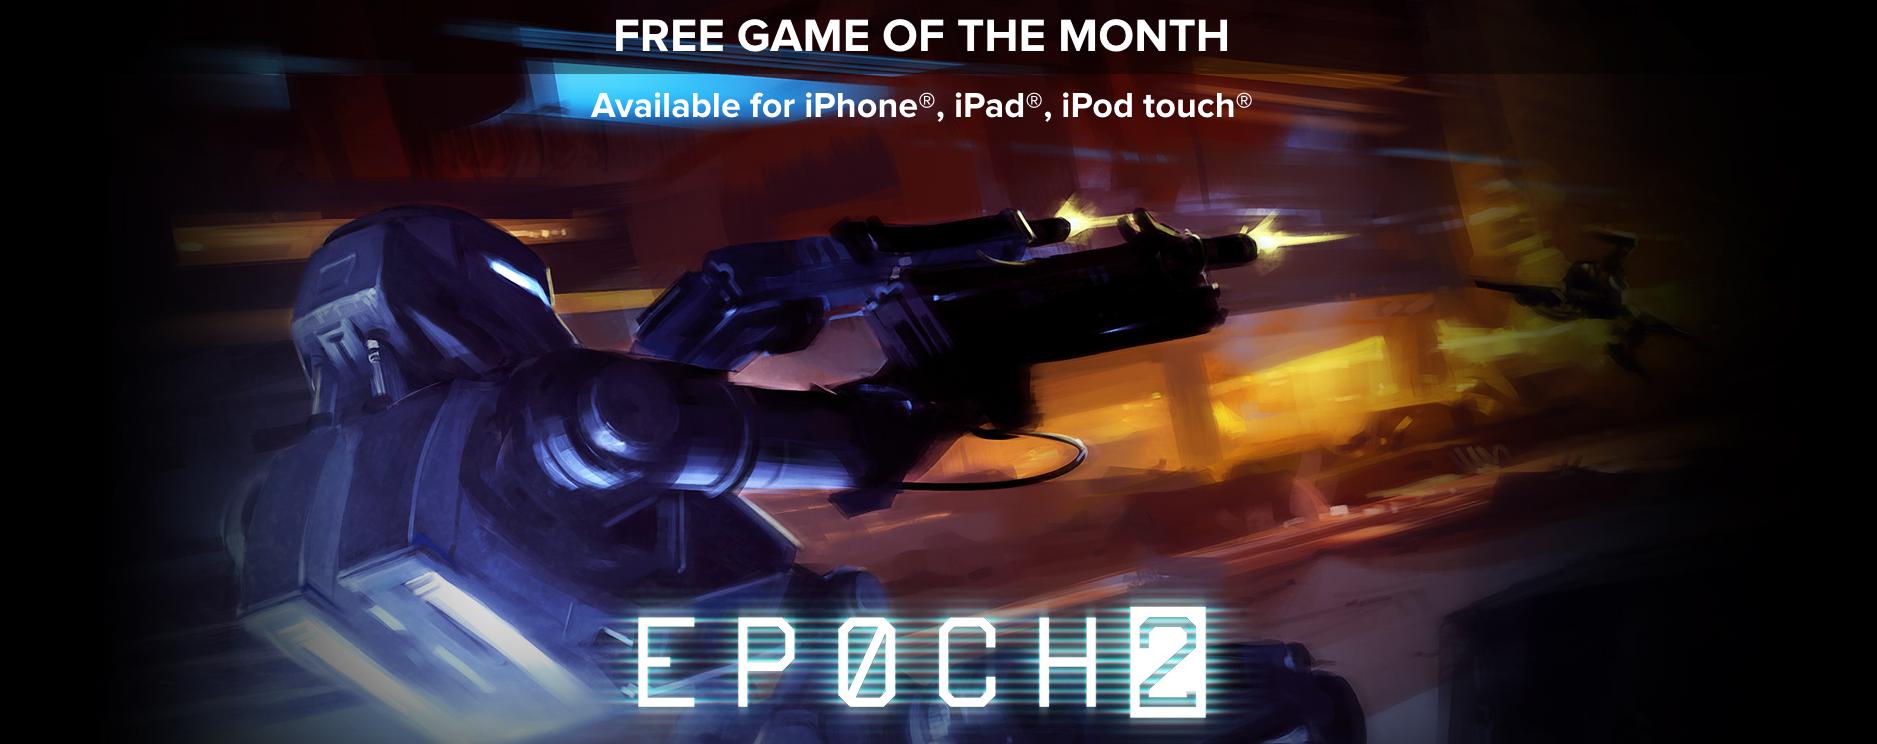 epoch2_ign_free_promo